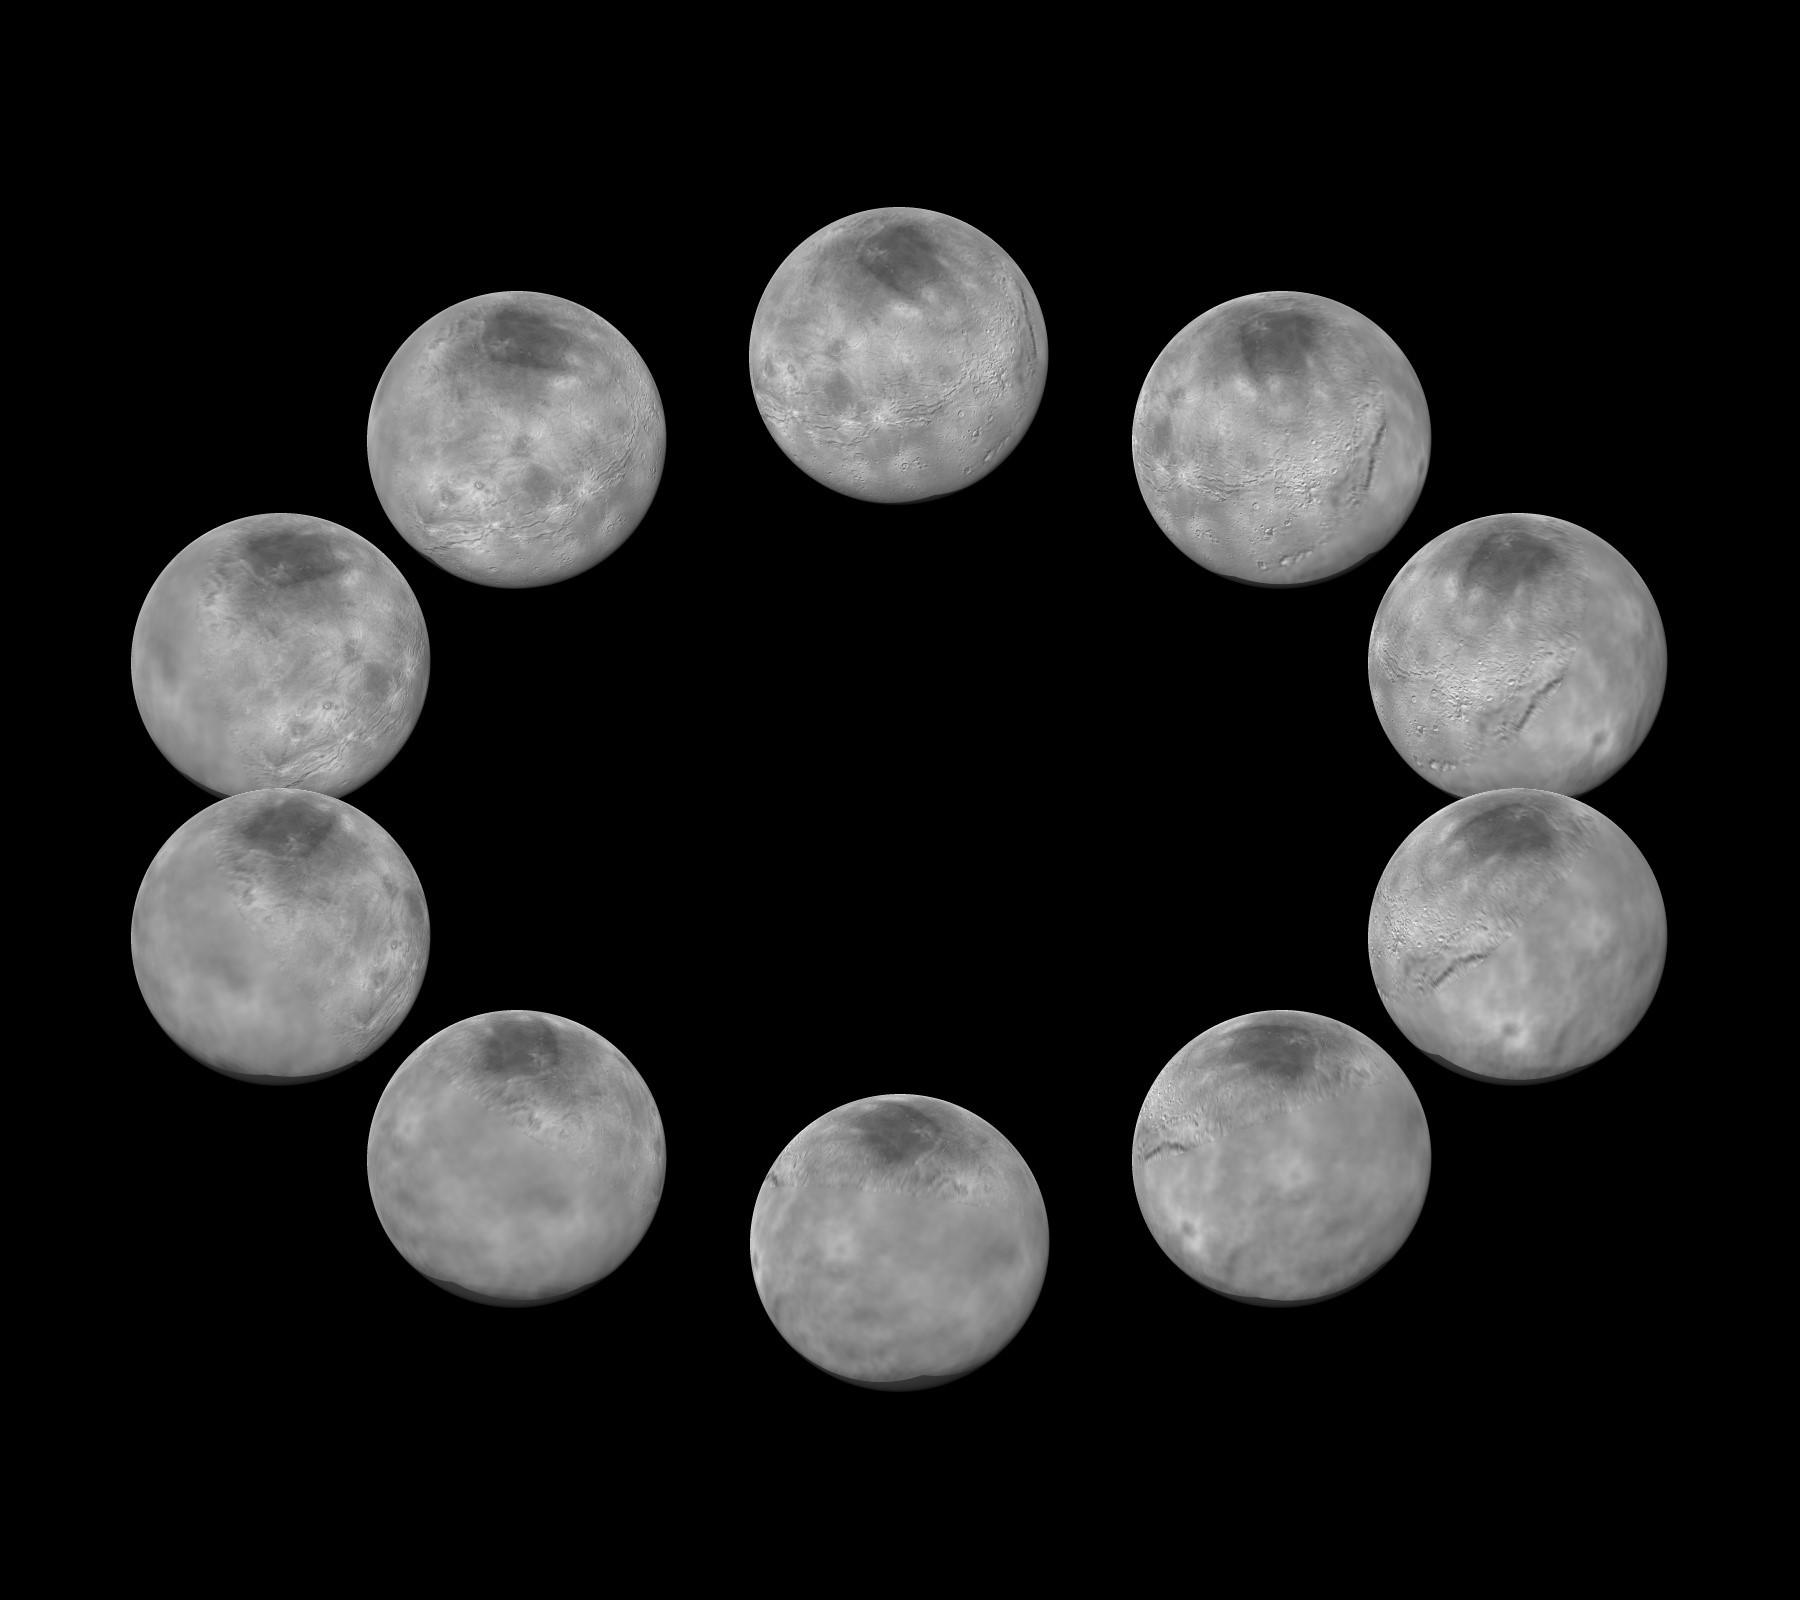 Charon Moon National Aeronautics And Space